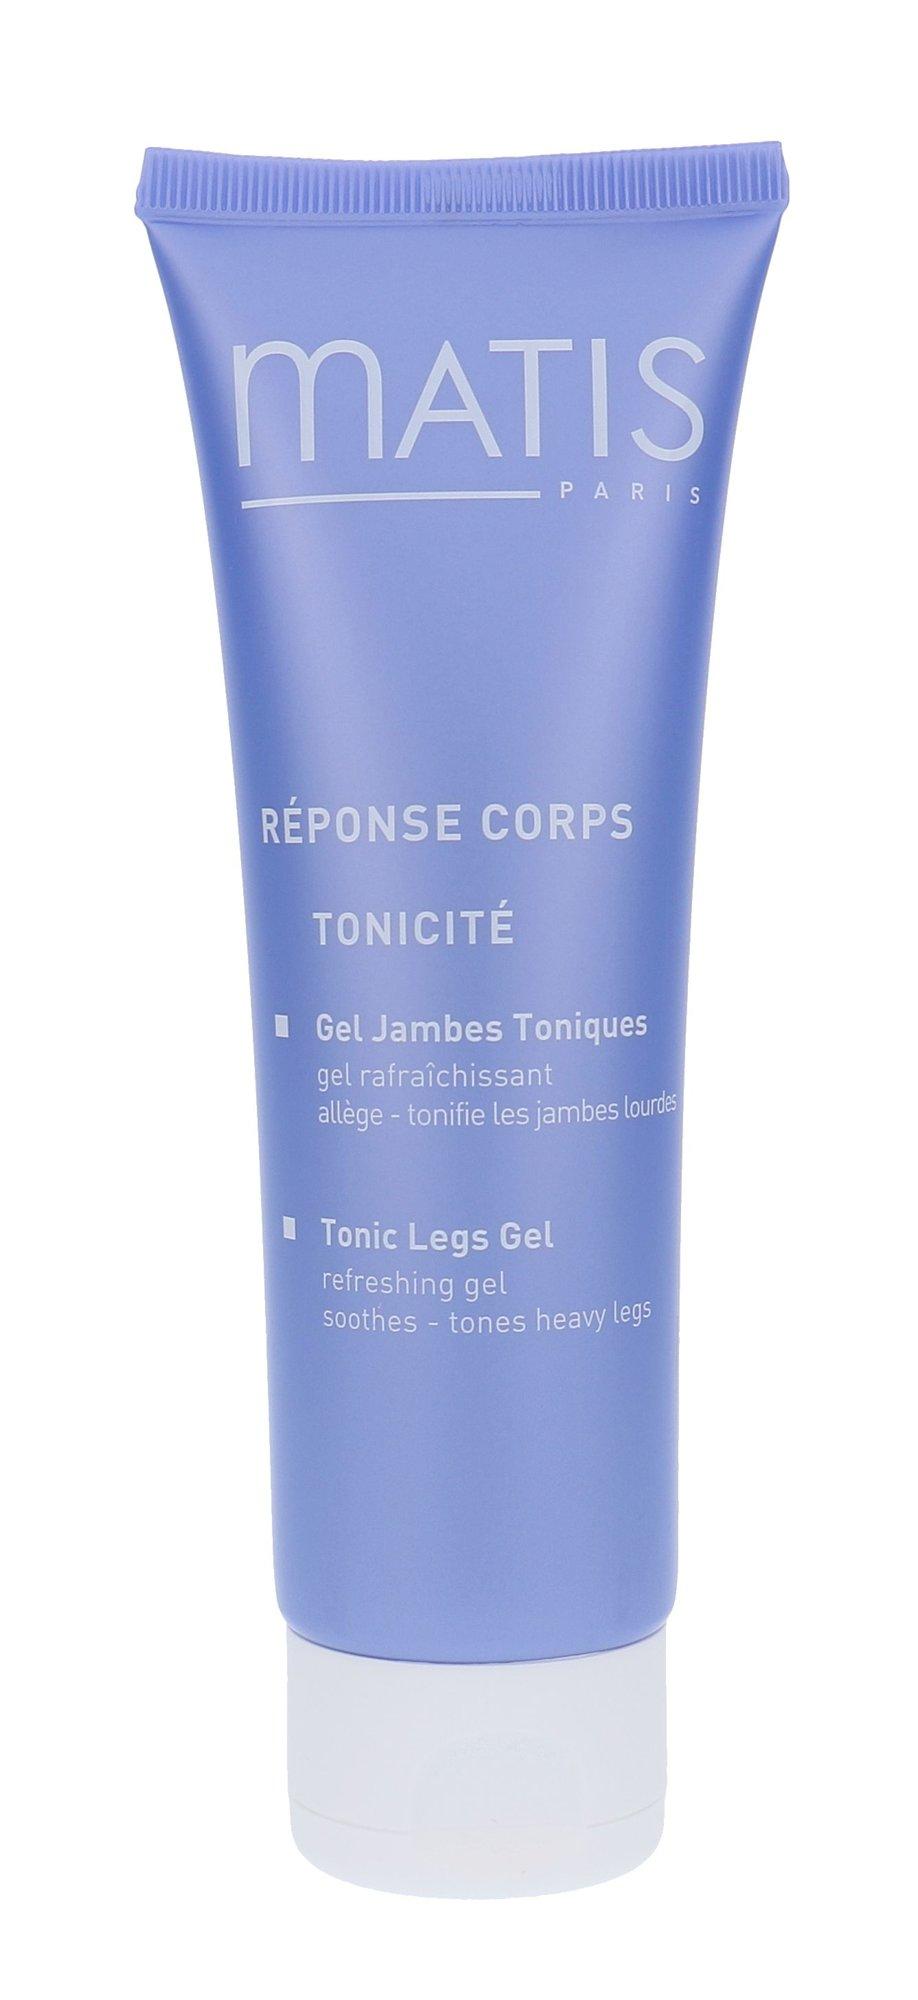 Matis Réponse Corps Cosmetic 125ml  Tonic Legs Gel